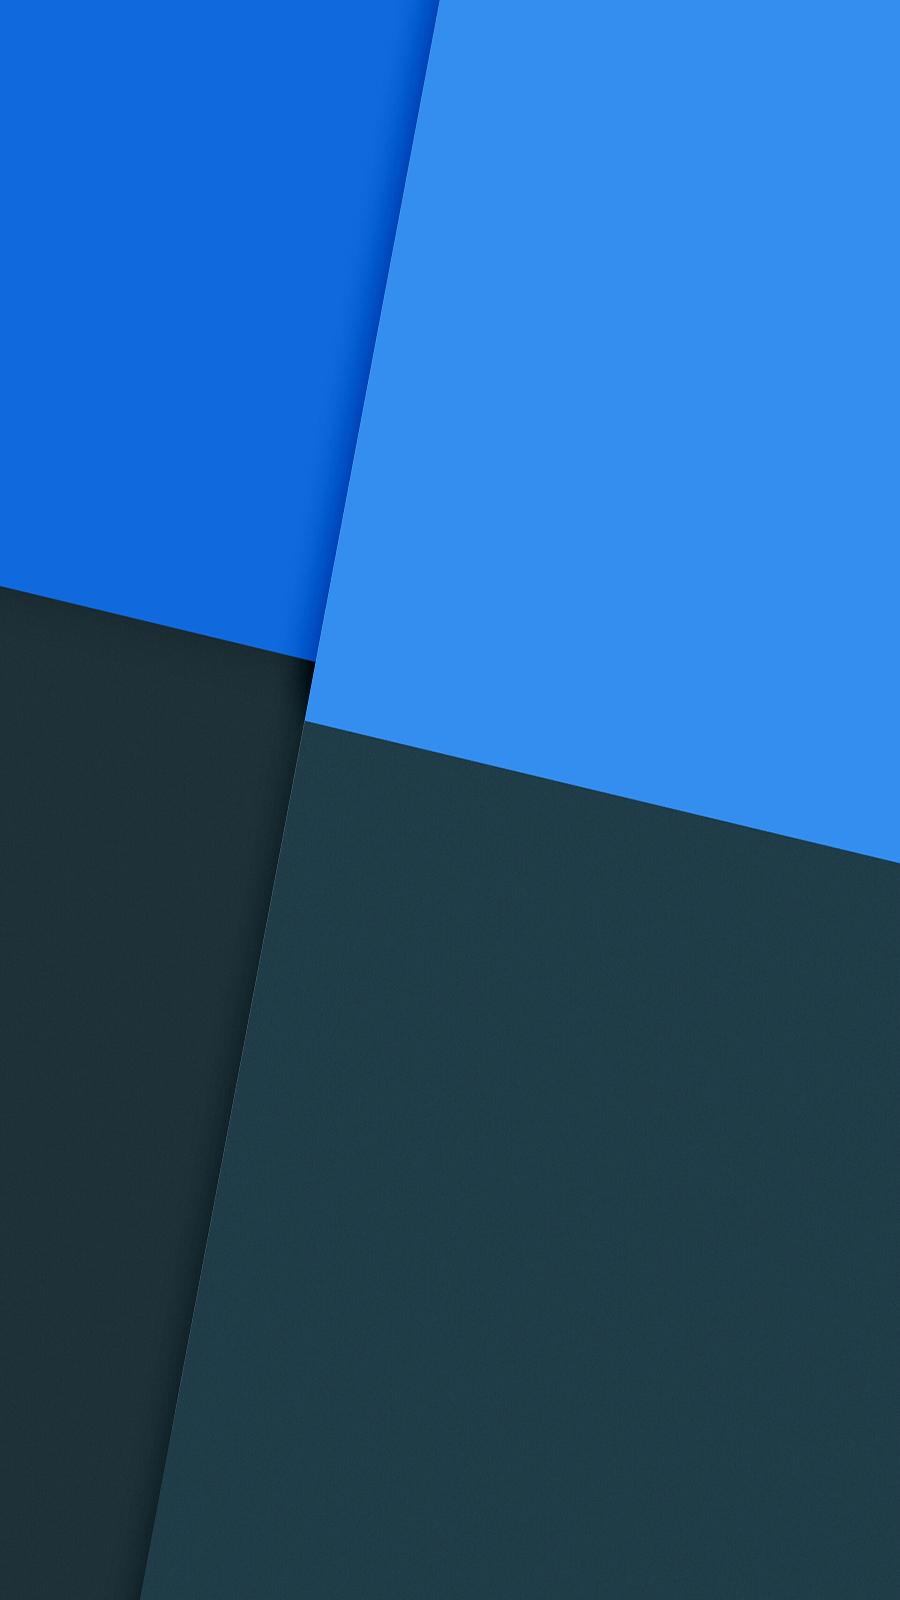 Samsung Galaxy J6 Background Wallpapers – Samsung Wallpaper